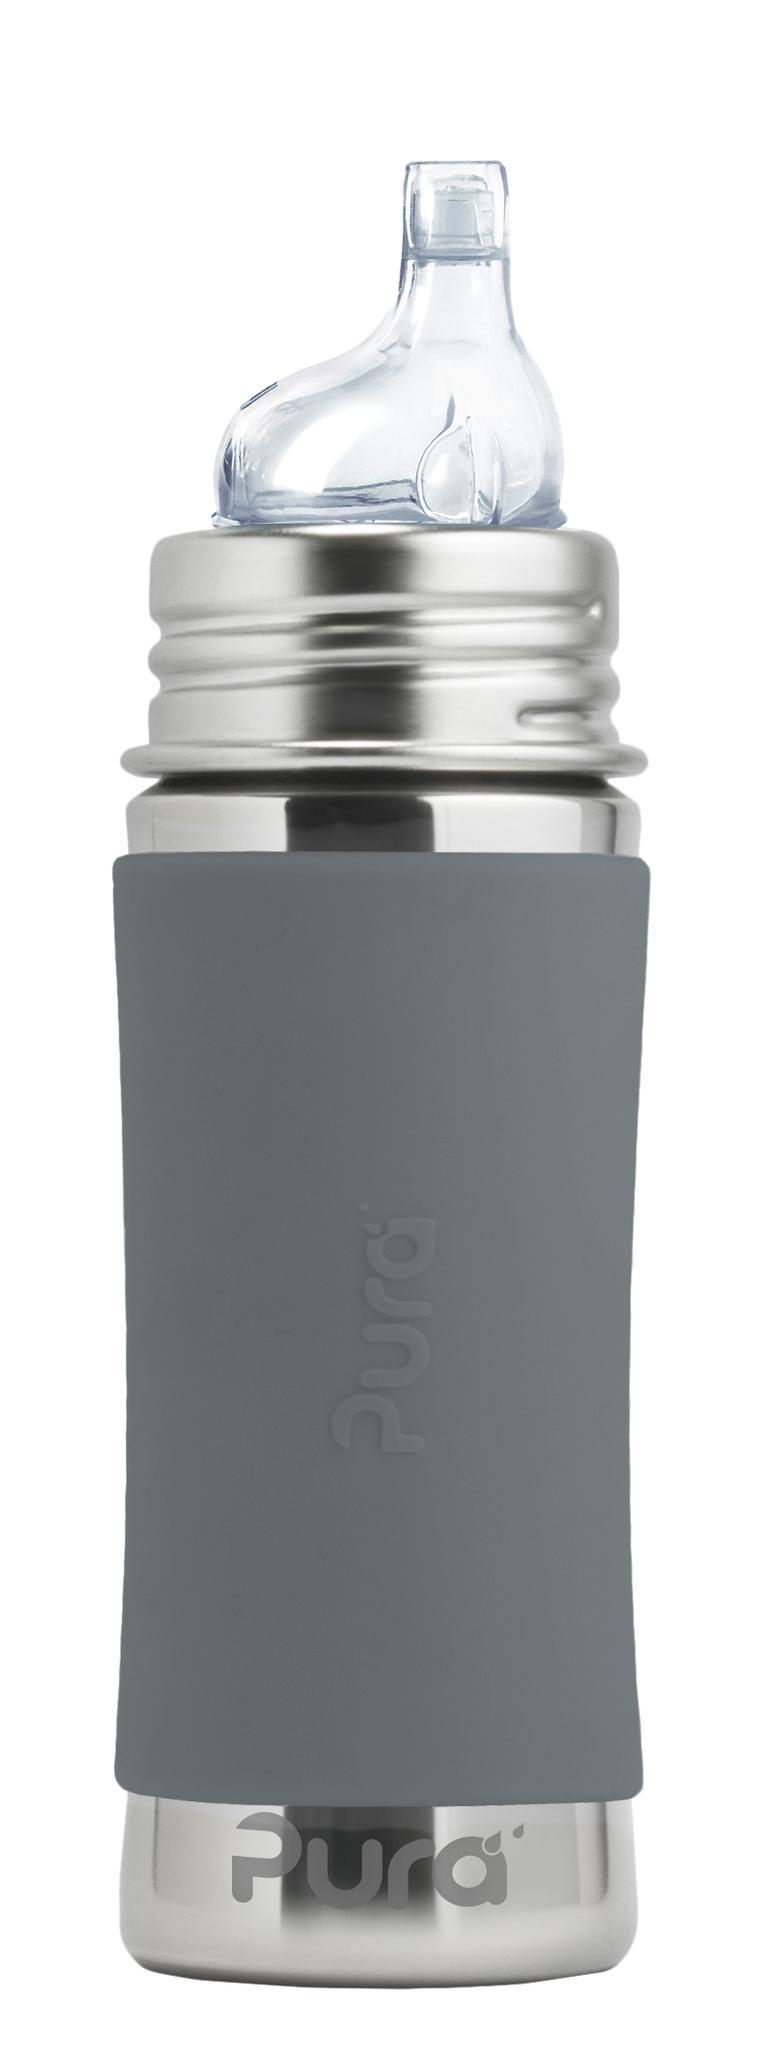 Детская стальная бутылочка-поильник Pura Kiki 325 мл (6 мес+) (серый)